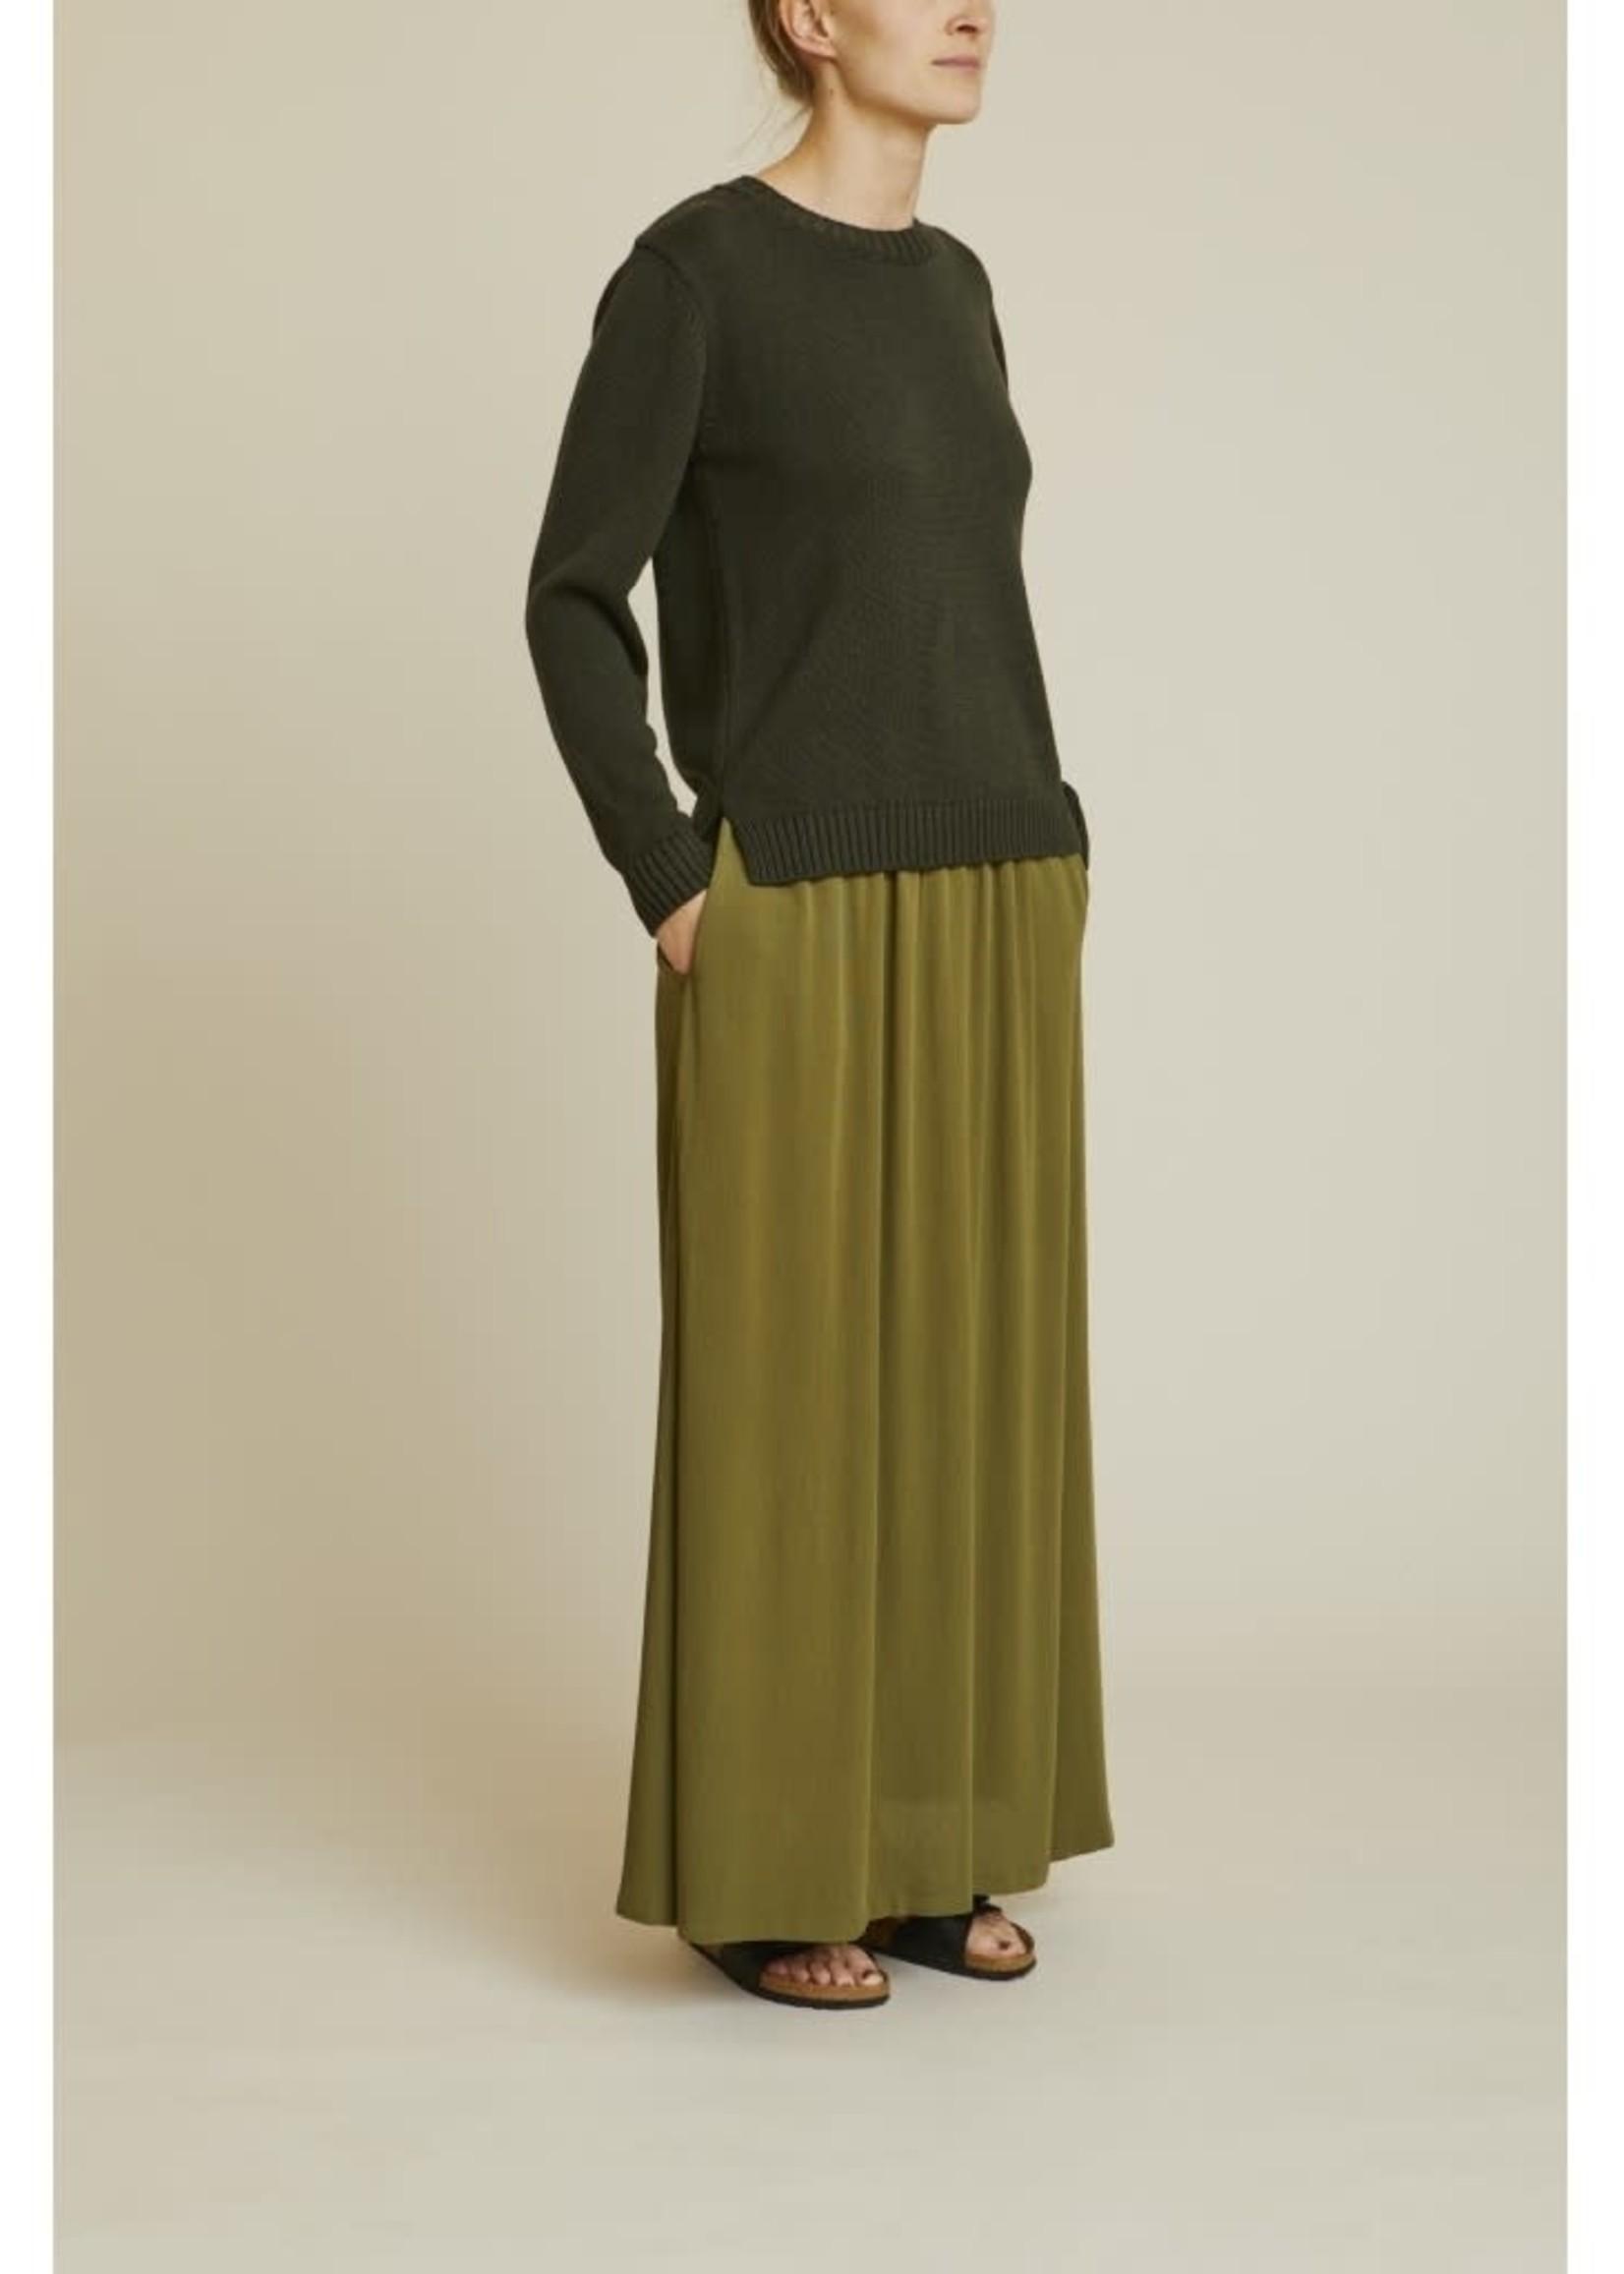 Basic Apparel Felicia Skirt